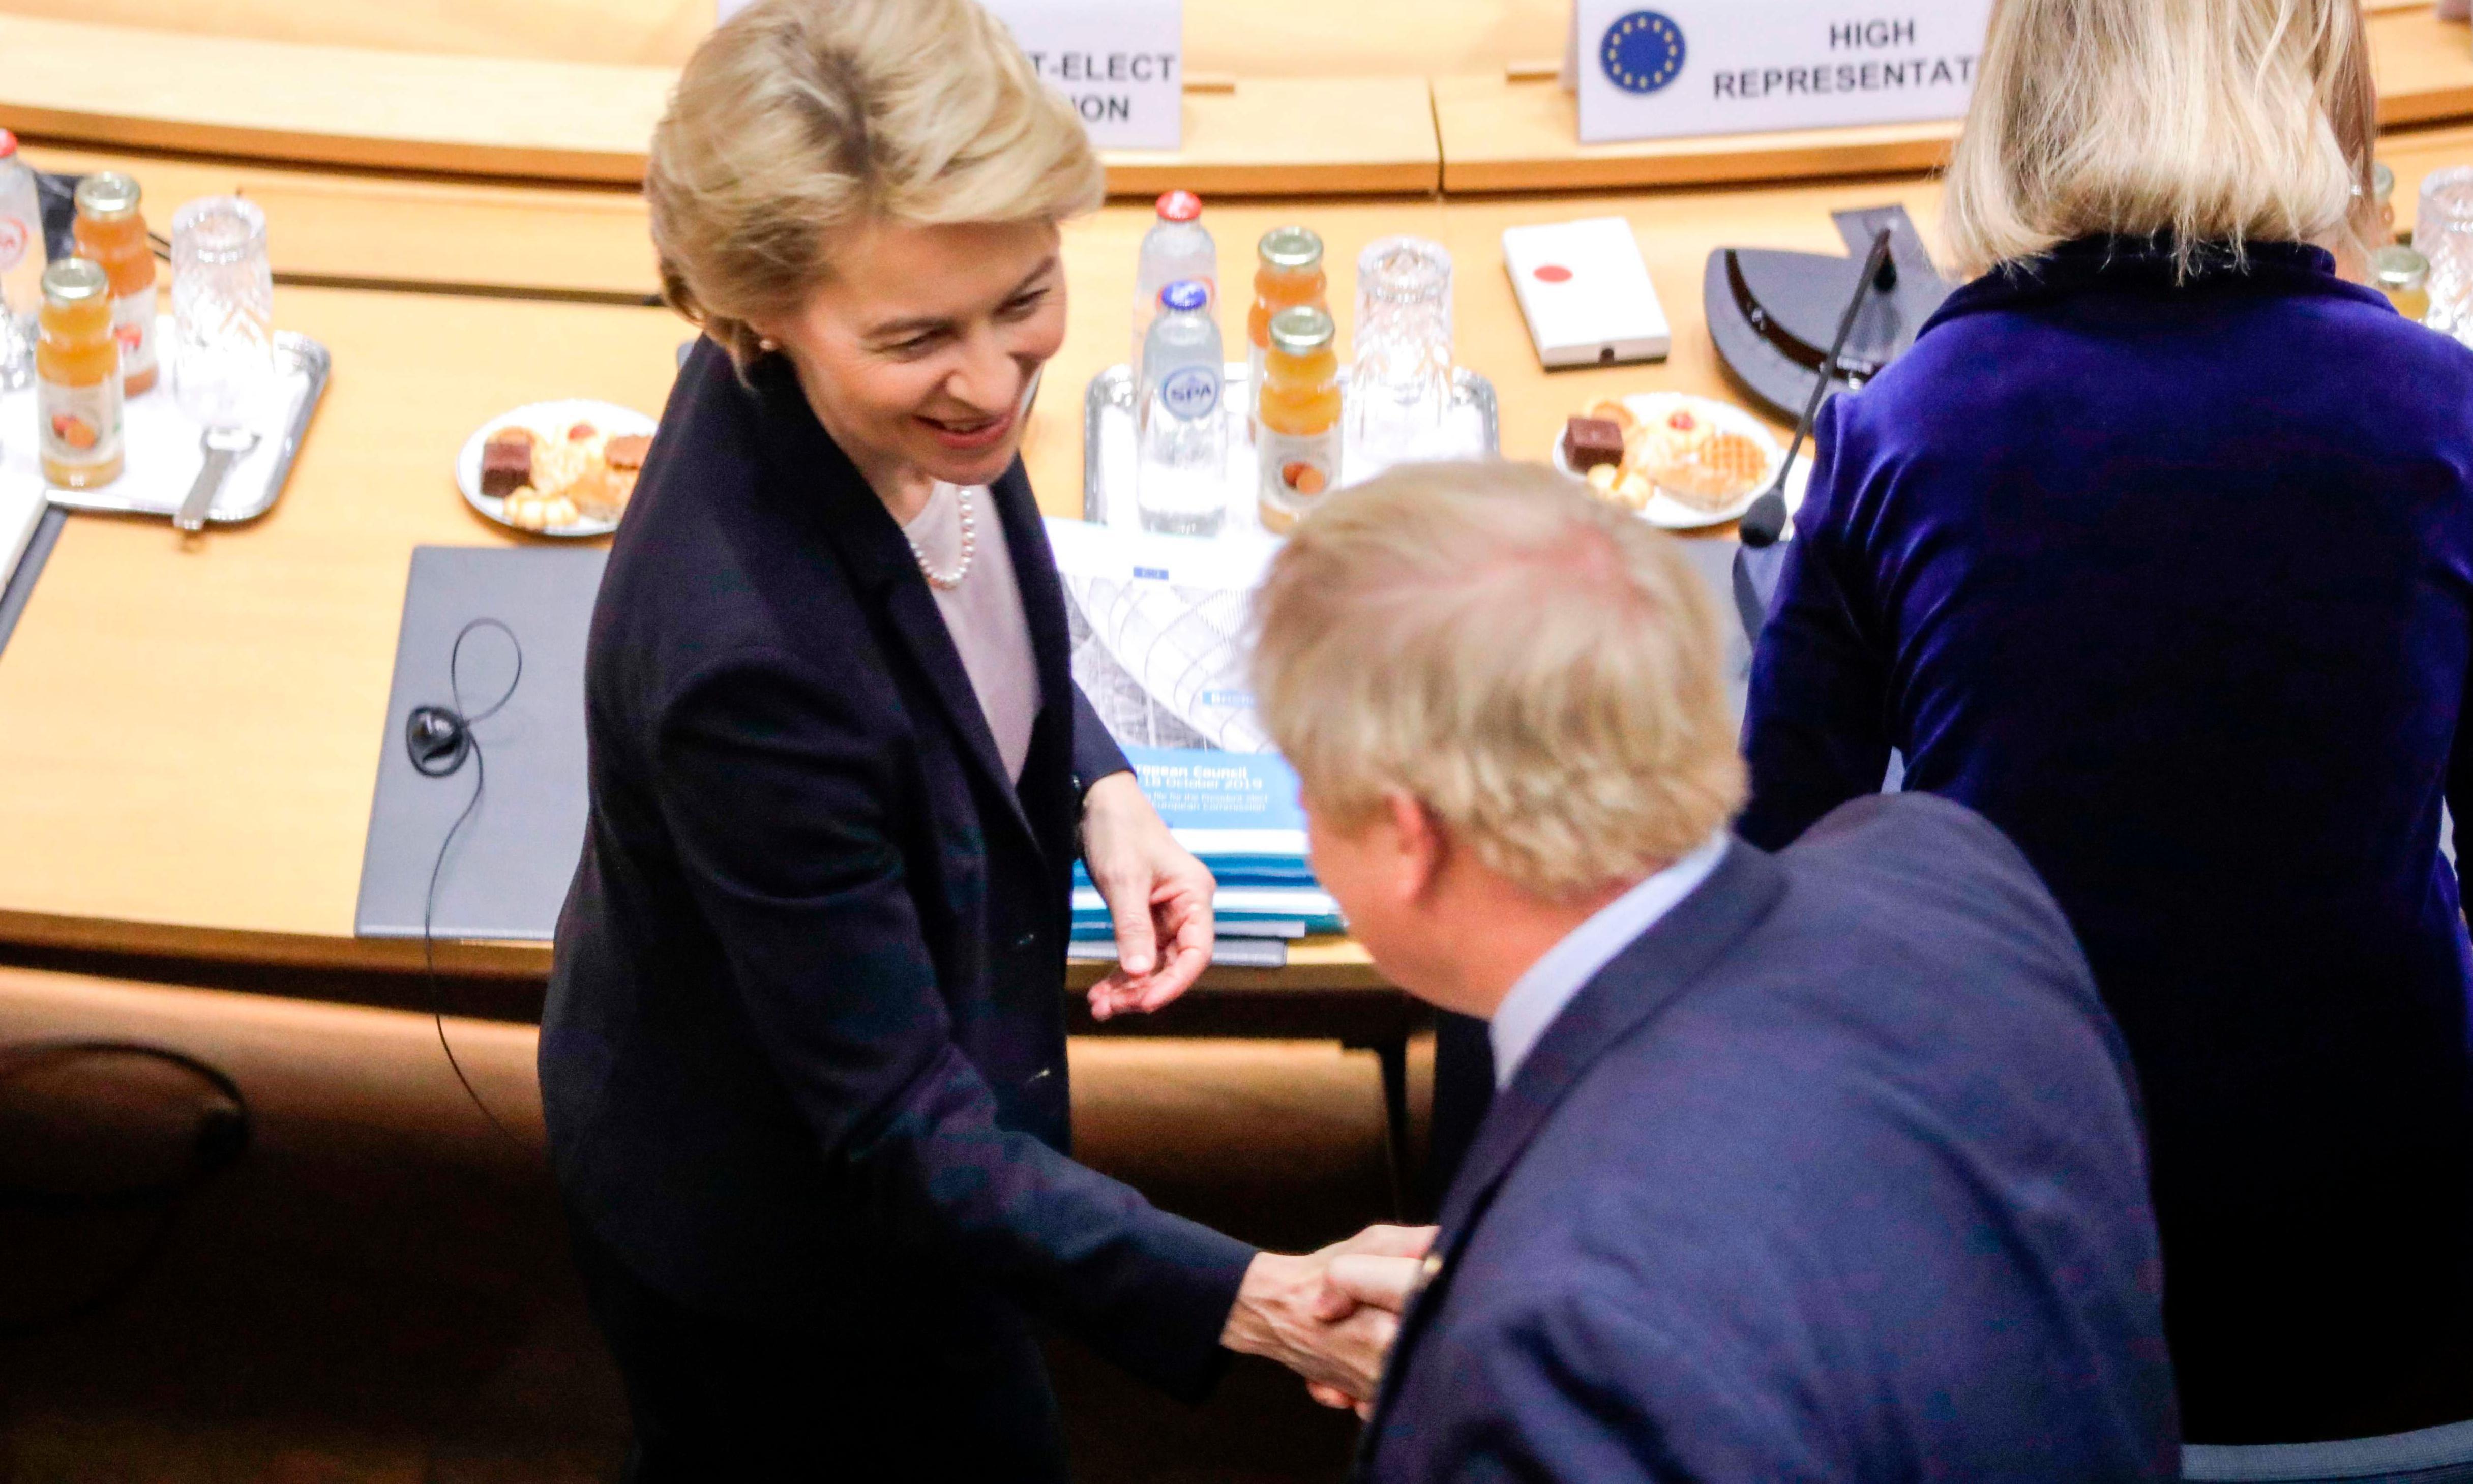 Boris Johnson set to break pledge not to nominate EU commissioner